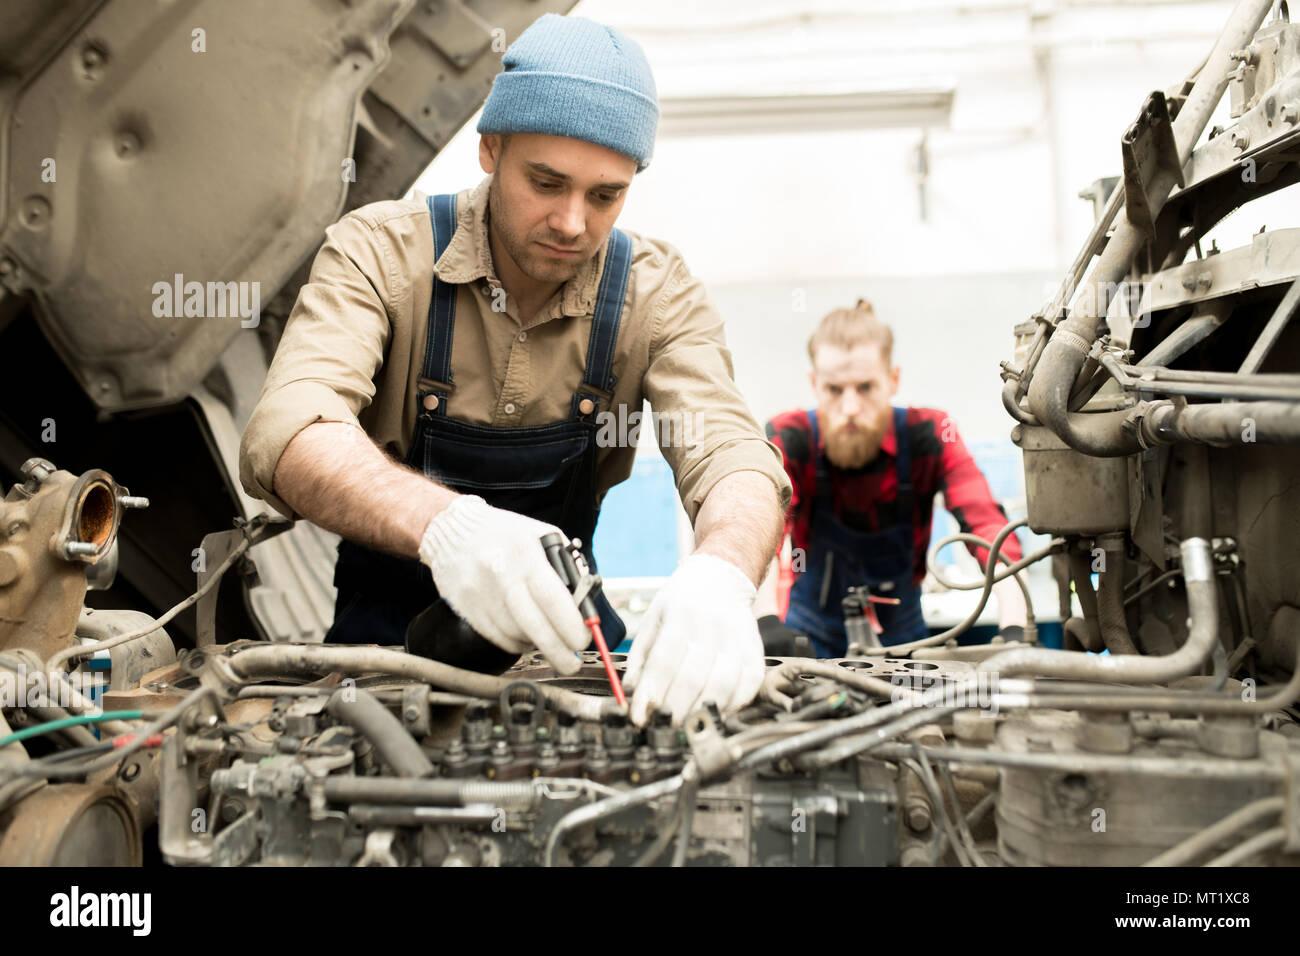 Automechaniker Reparatur Lkw Stockbild